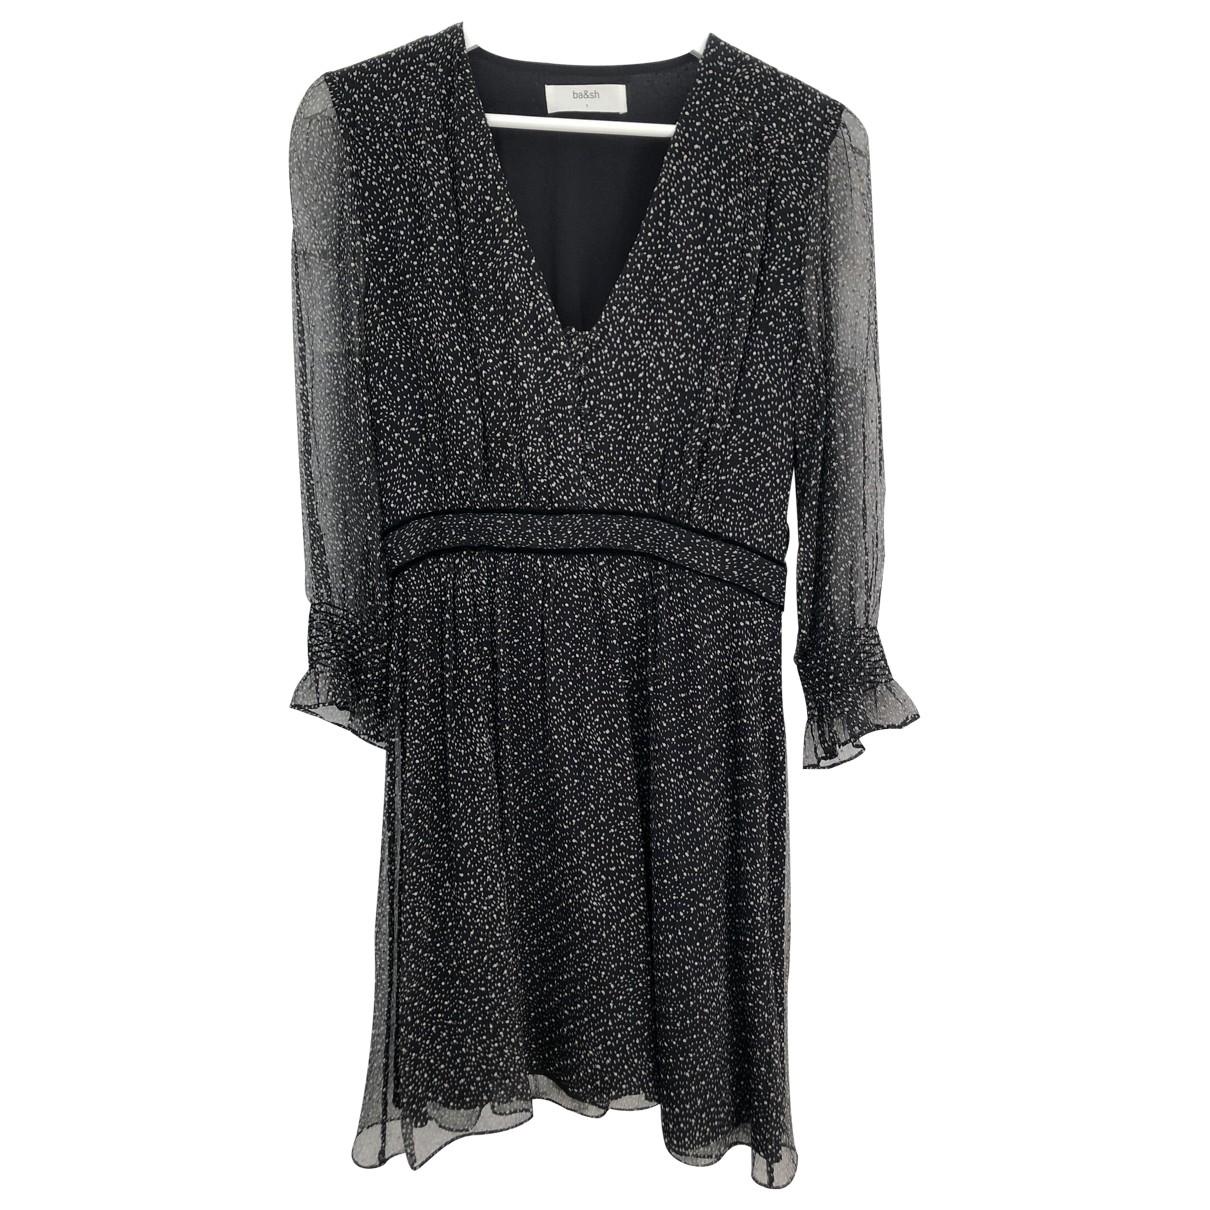 Ba&sh - Robe Spring Summer 2019 pour femme en soie - noir